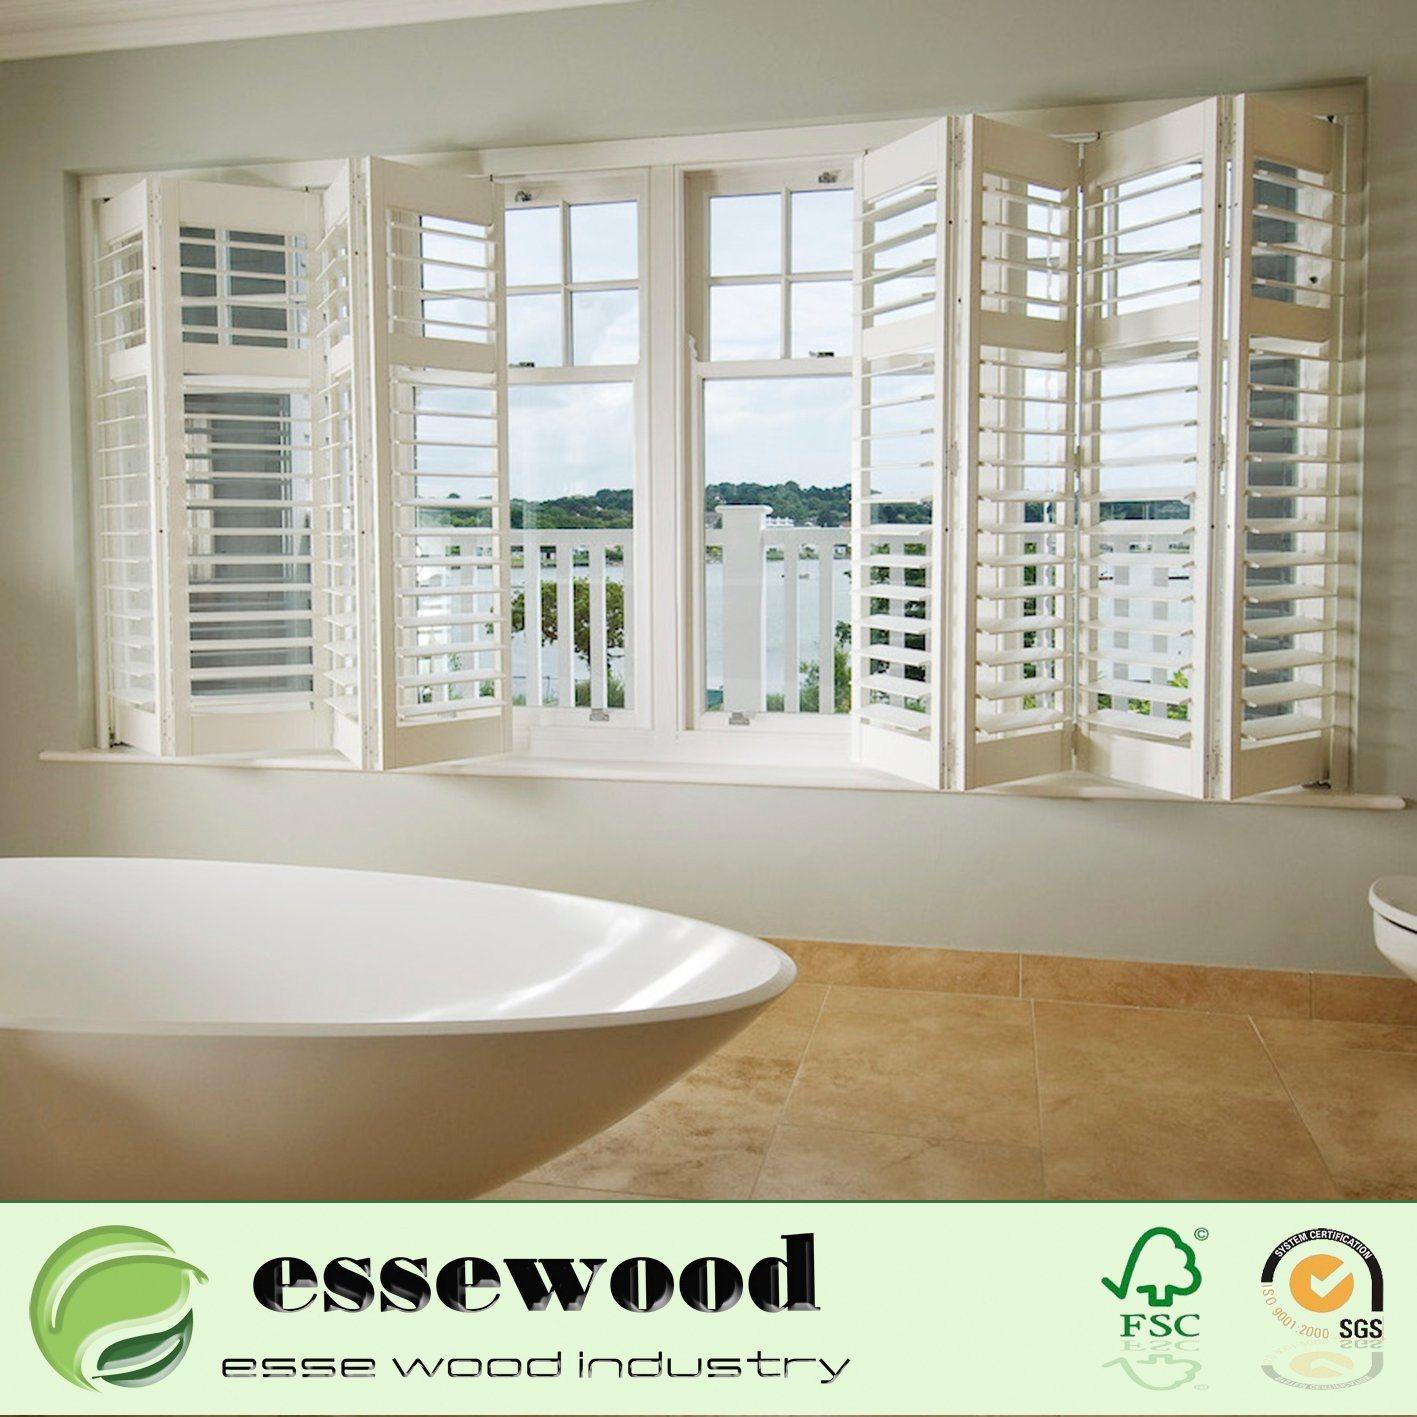 Hot Item White Wood Interior Push Rod Louvers Window Plantation Shutter